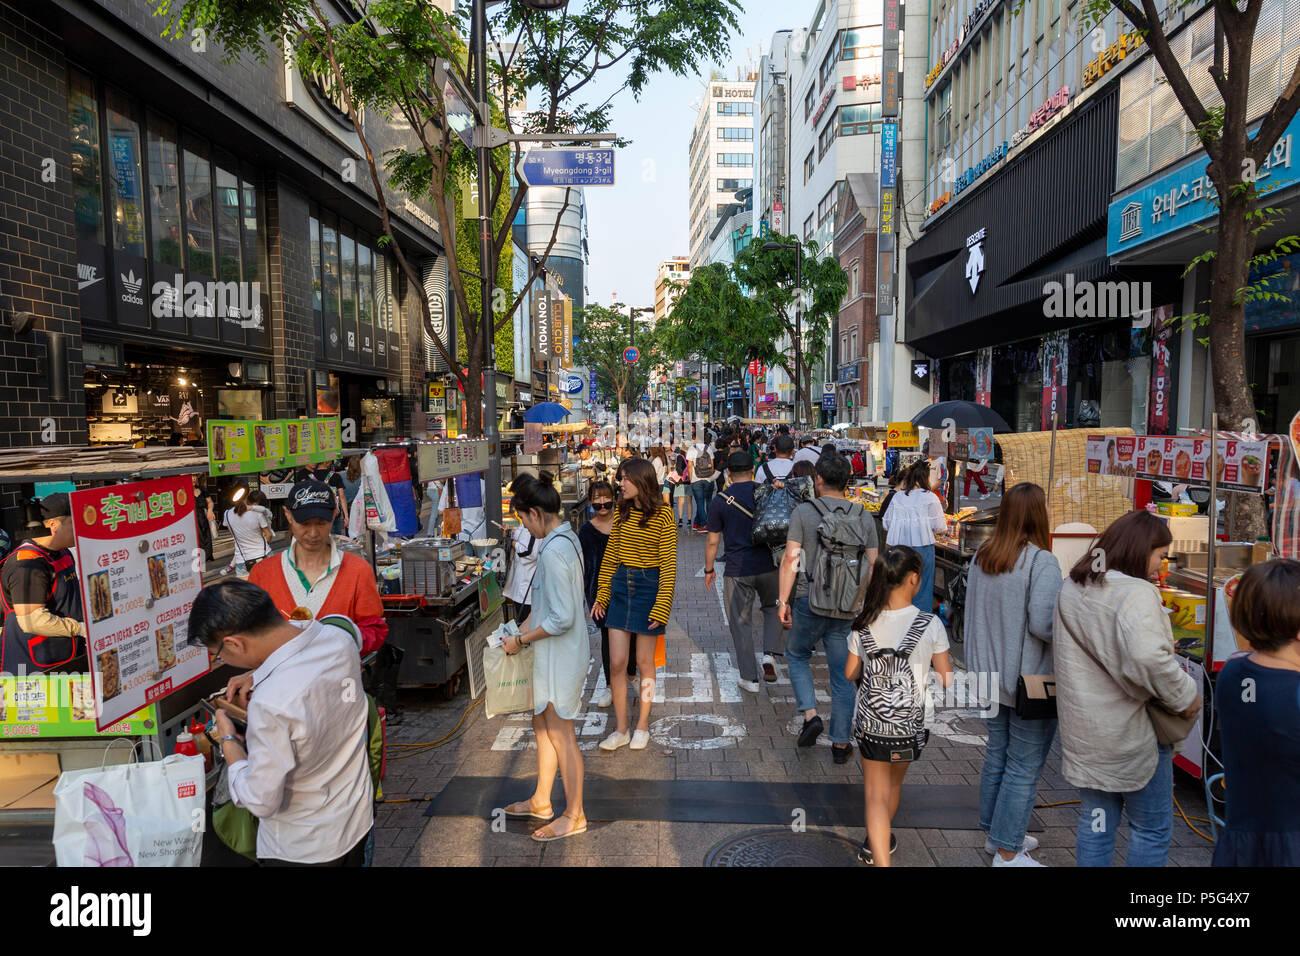 SEOUL, KOREA - MAY 28, 2018 : Myeong-Dong shopping street, Korean people buying and shopping at food stalls Stock Photo